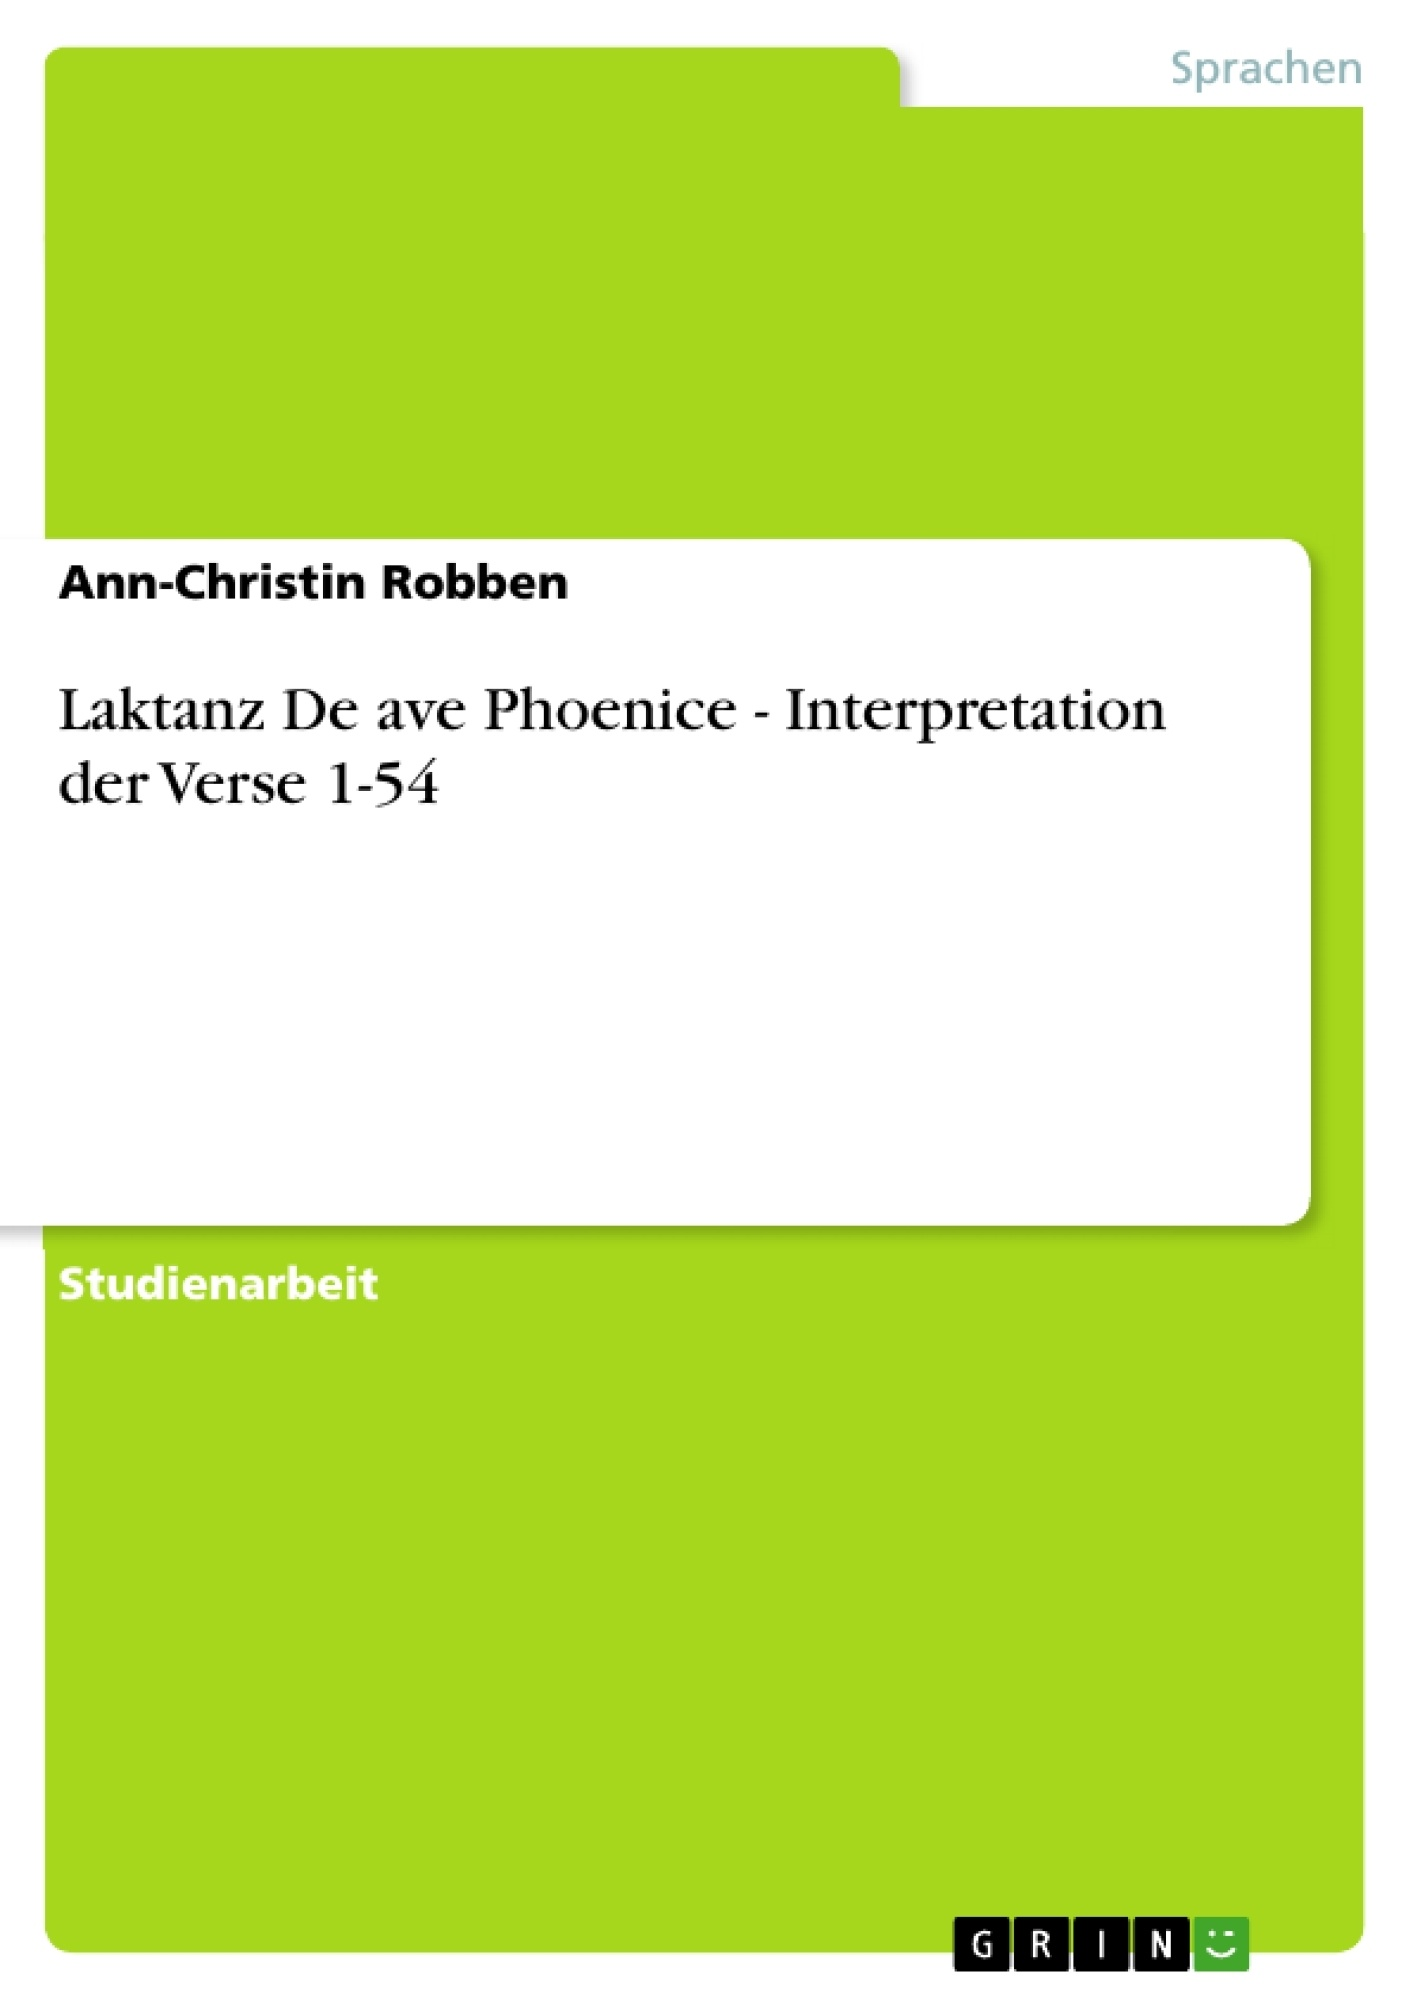 Titel: Laktanz De ave Phoenice - Interpretation der Verse 1-54